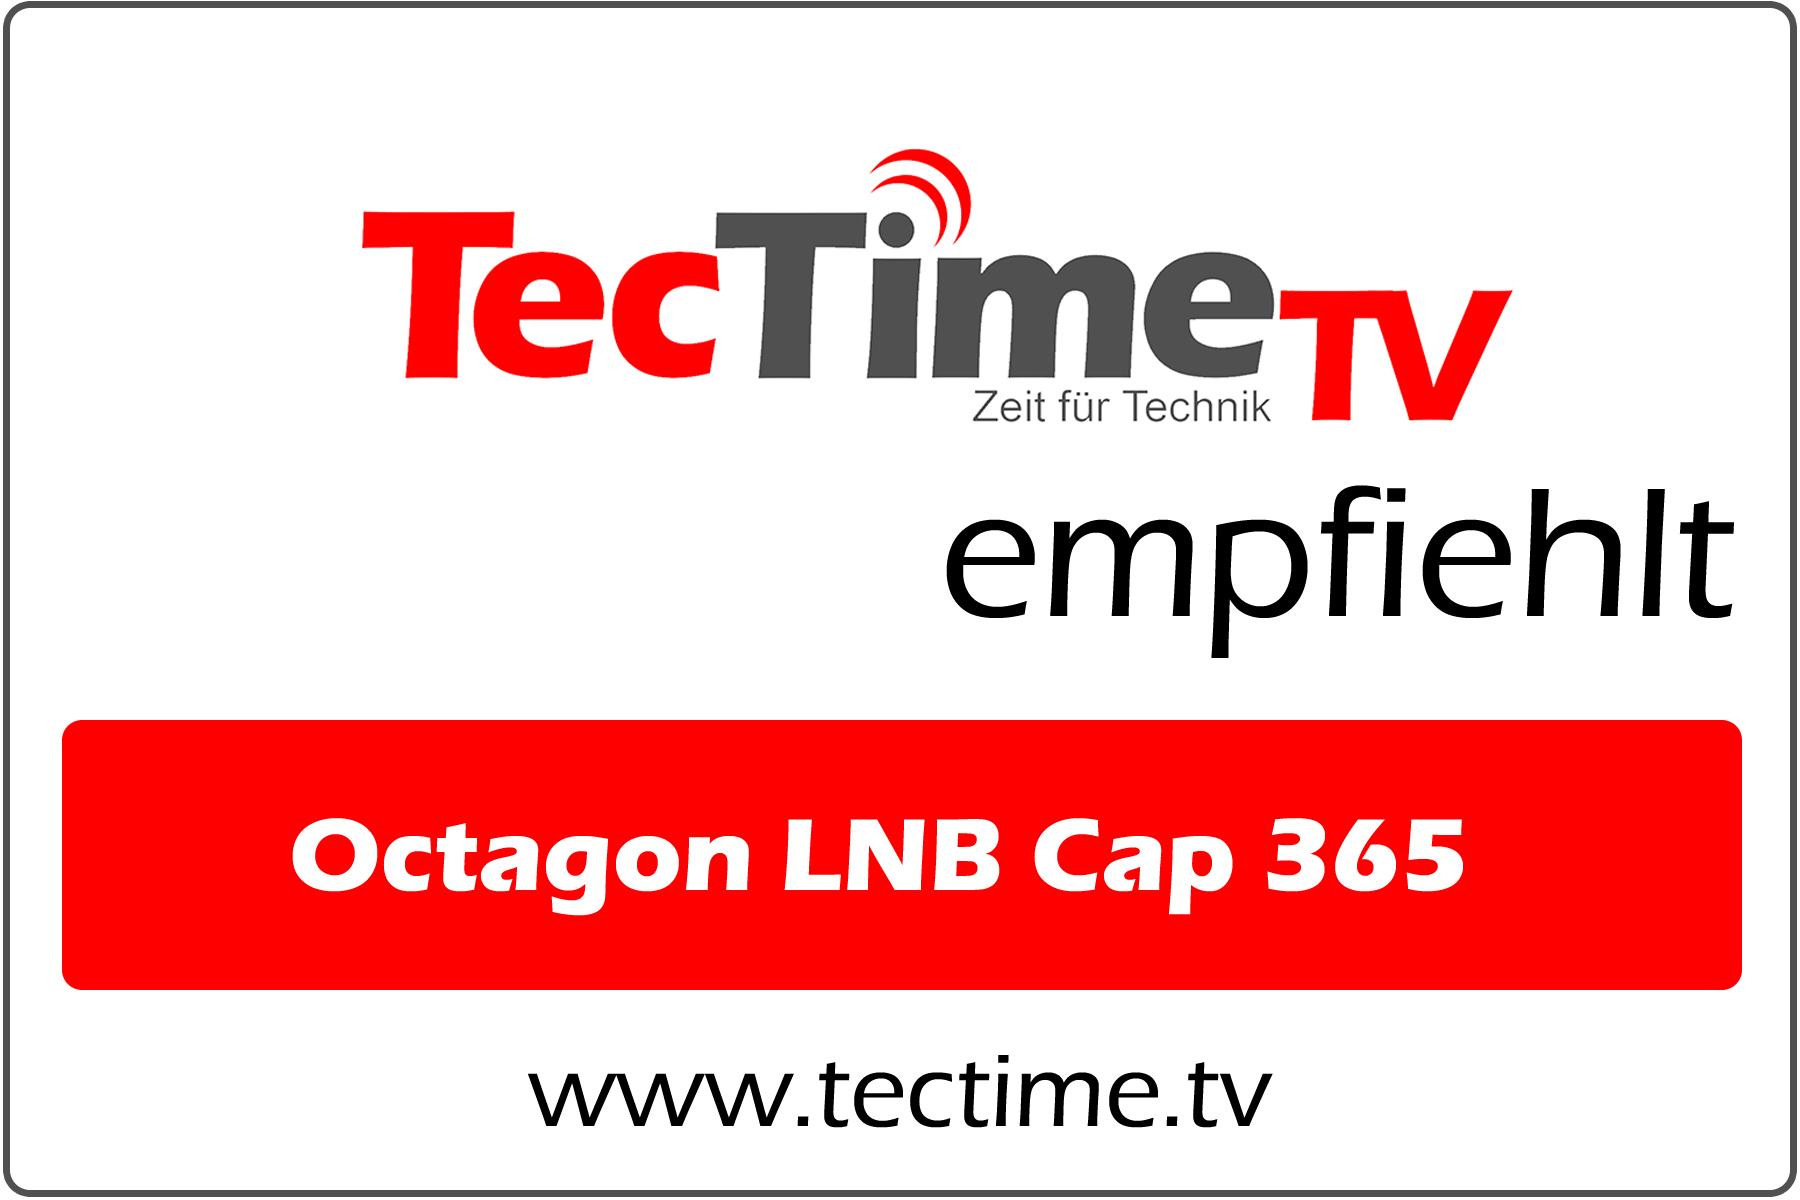 TecTime TV-Empfehlung LNB Cap 365